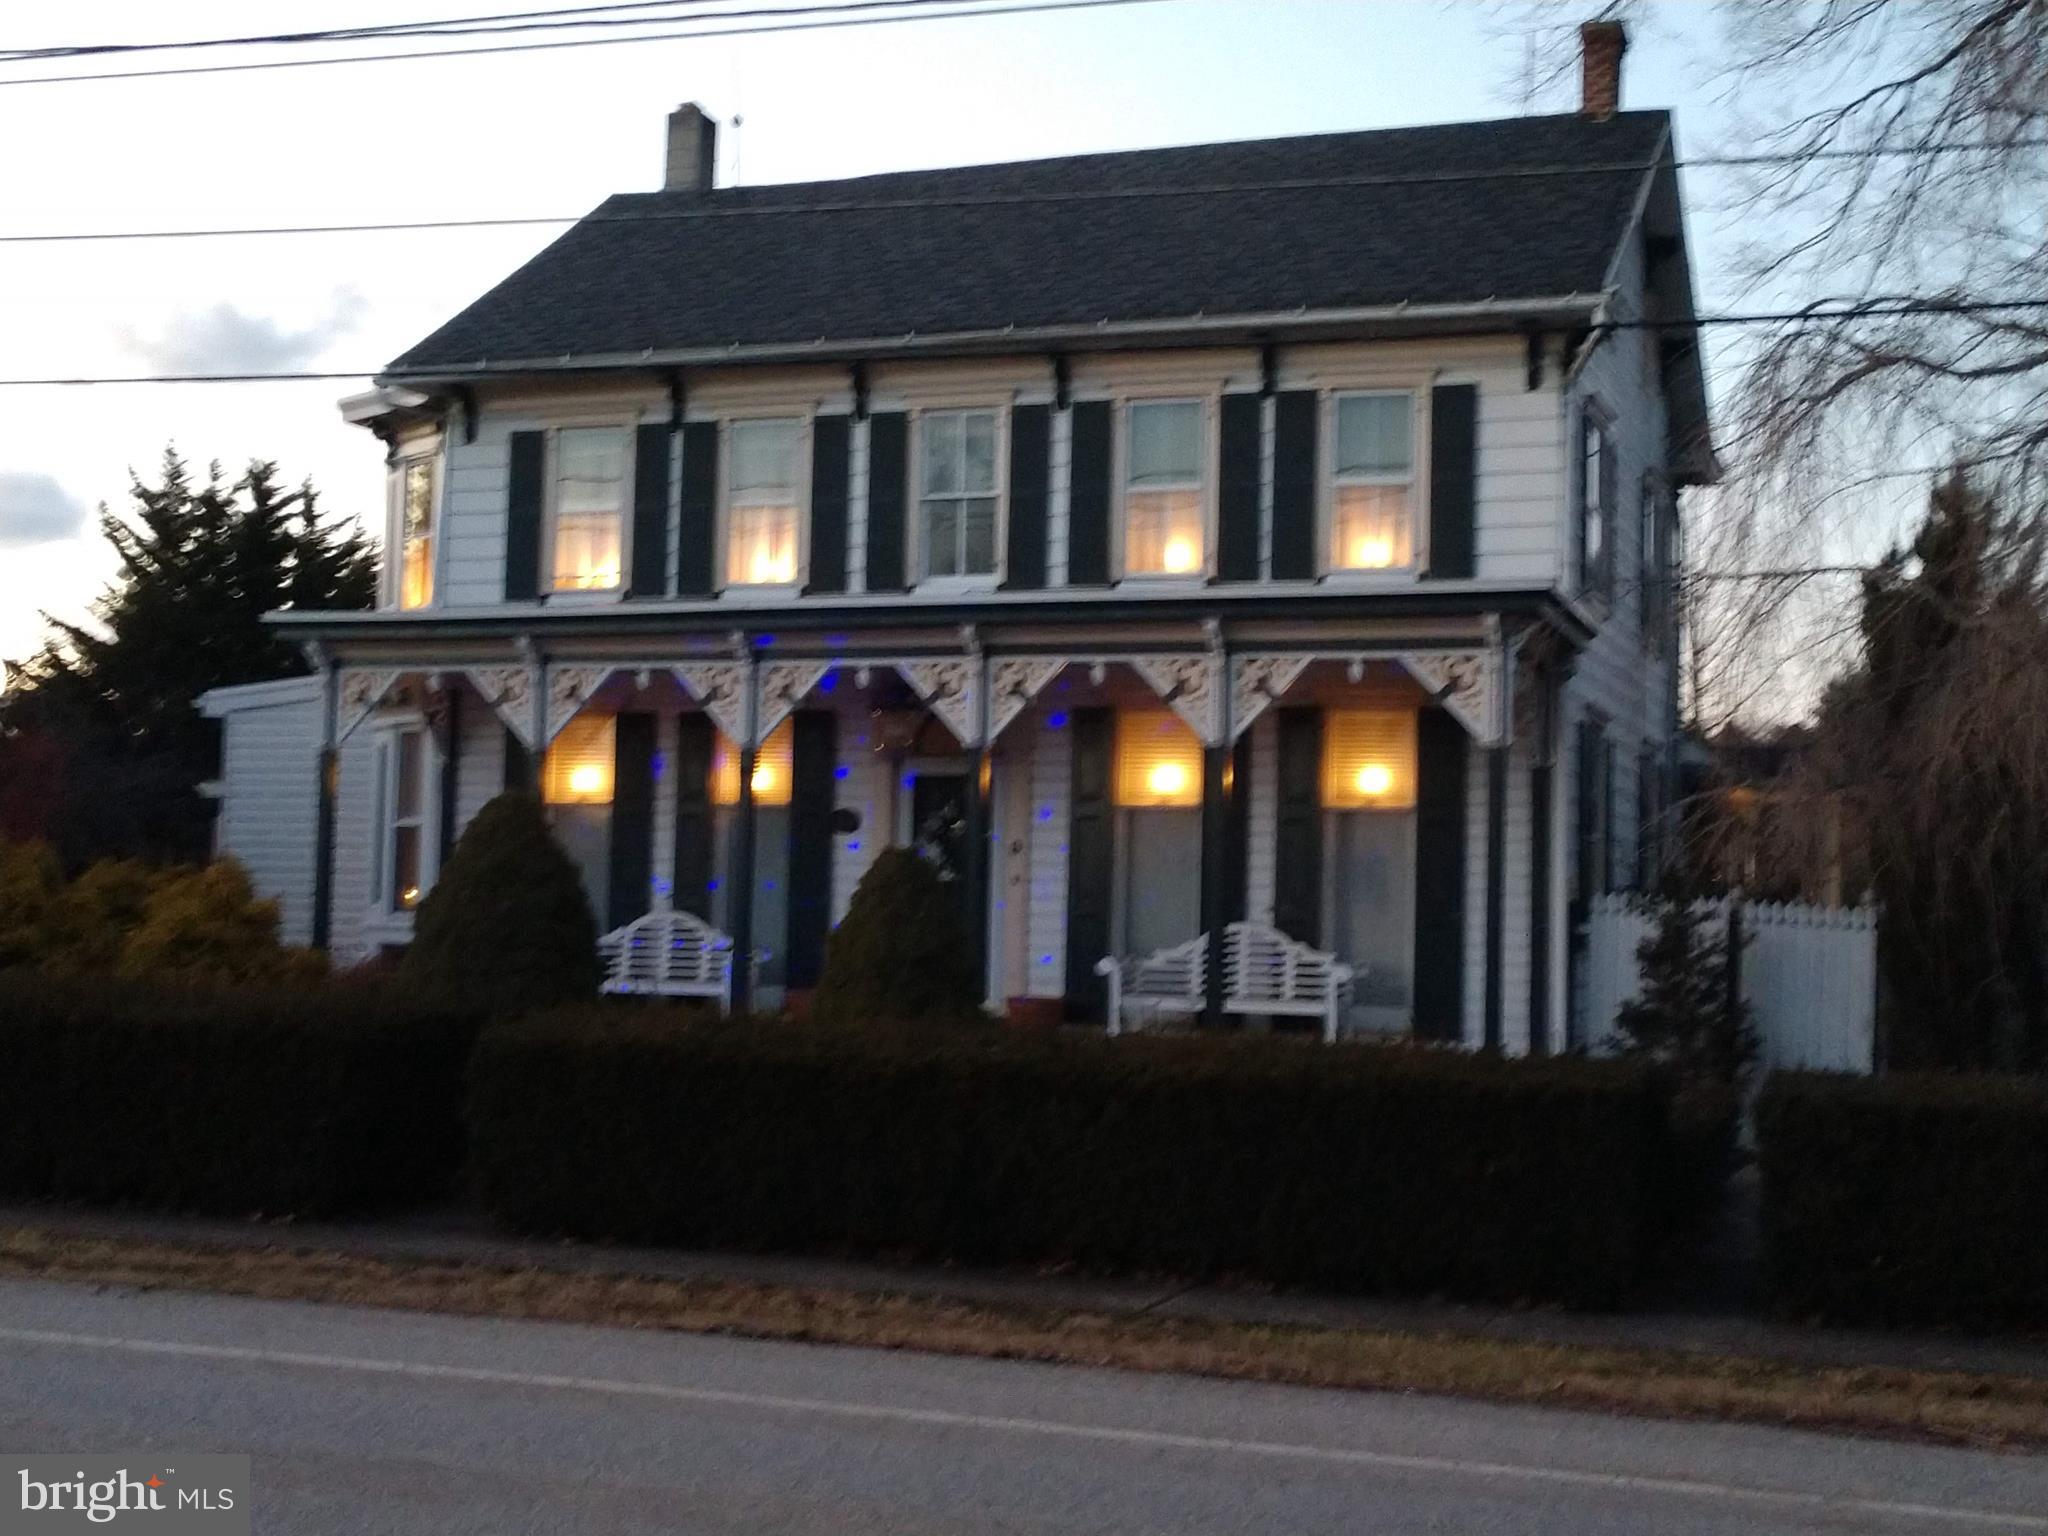 9 E MAIN STREET, NEW KINGSTOWN, PA 17072